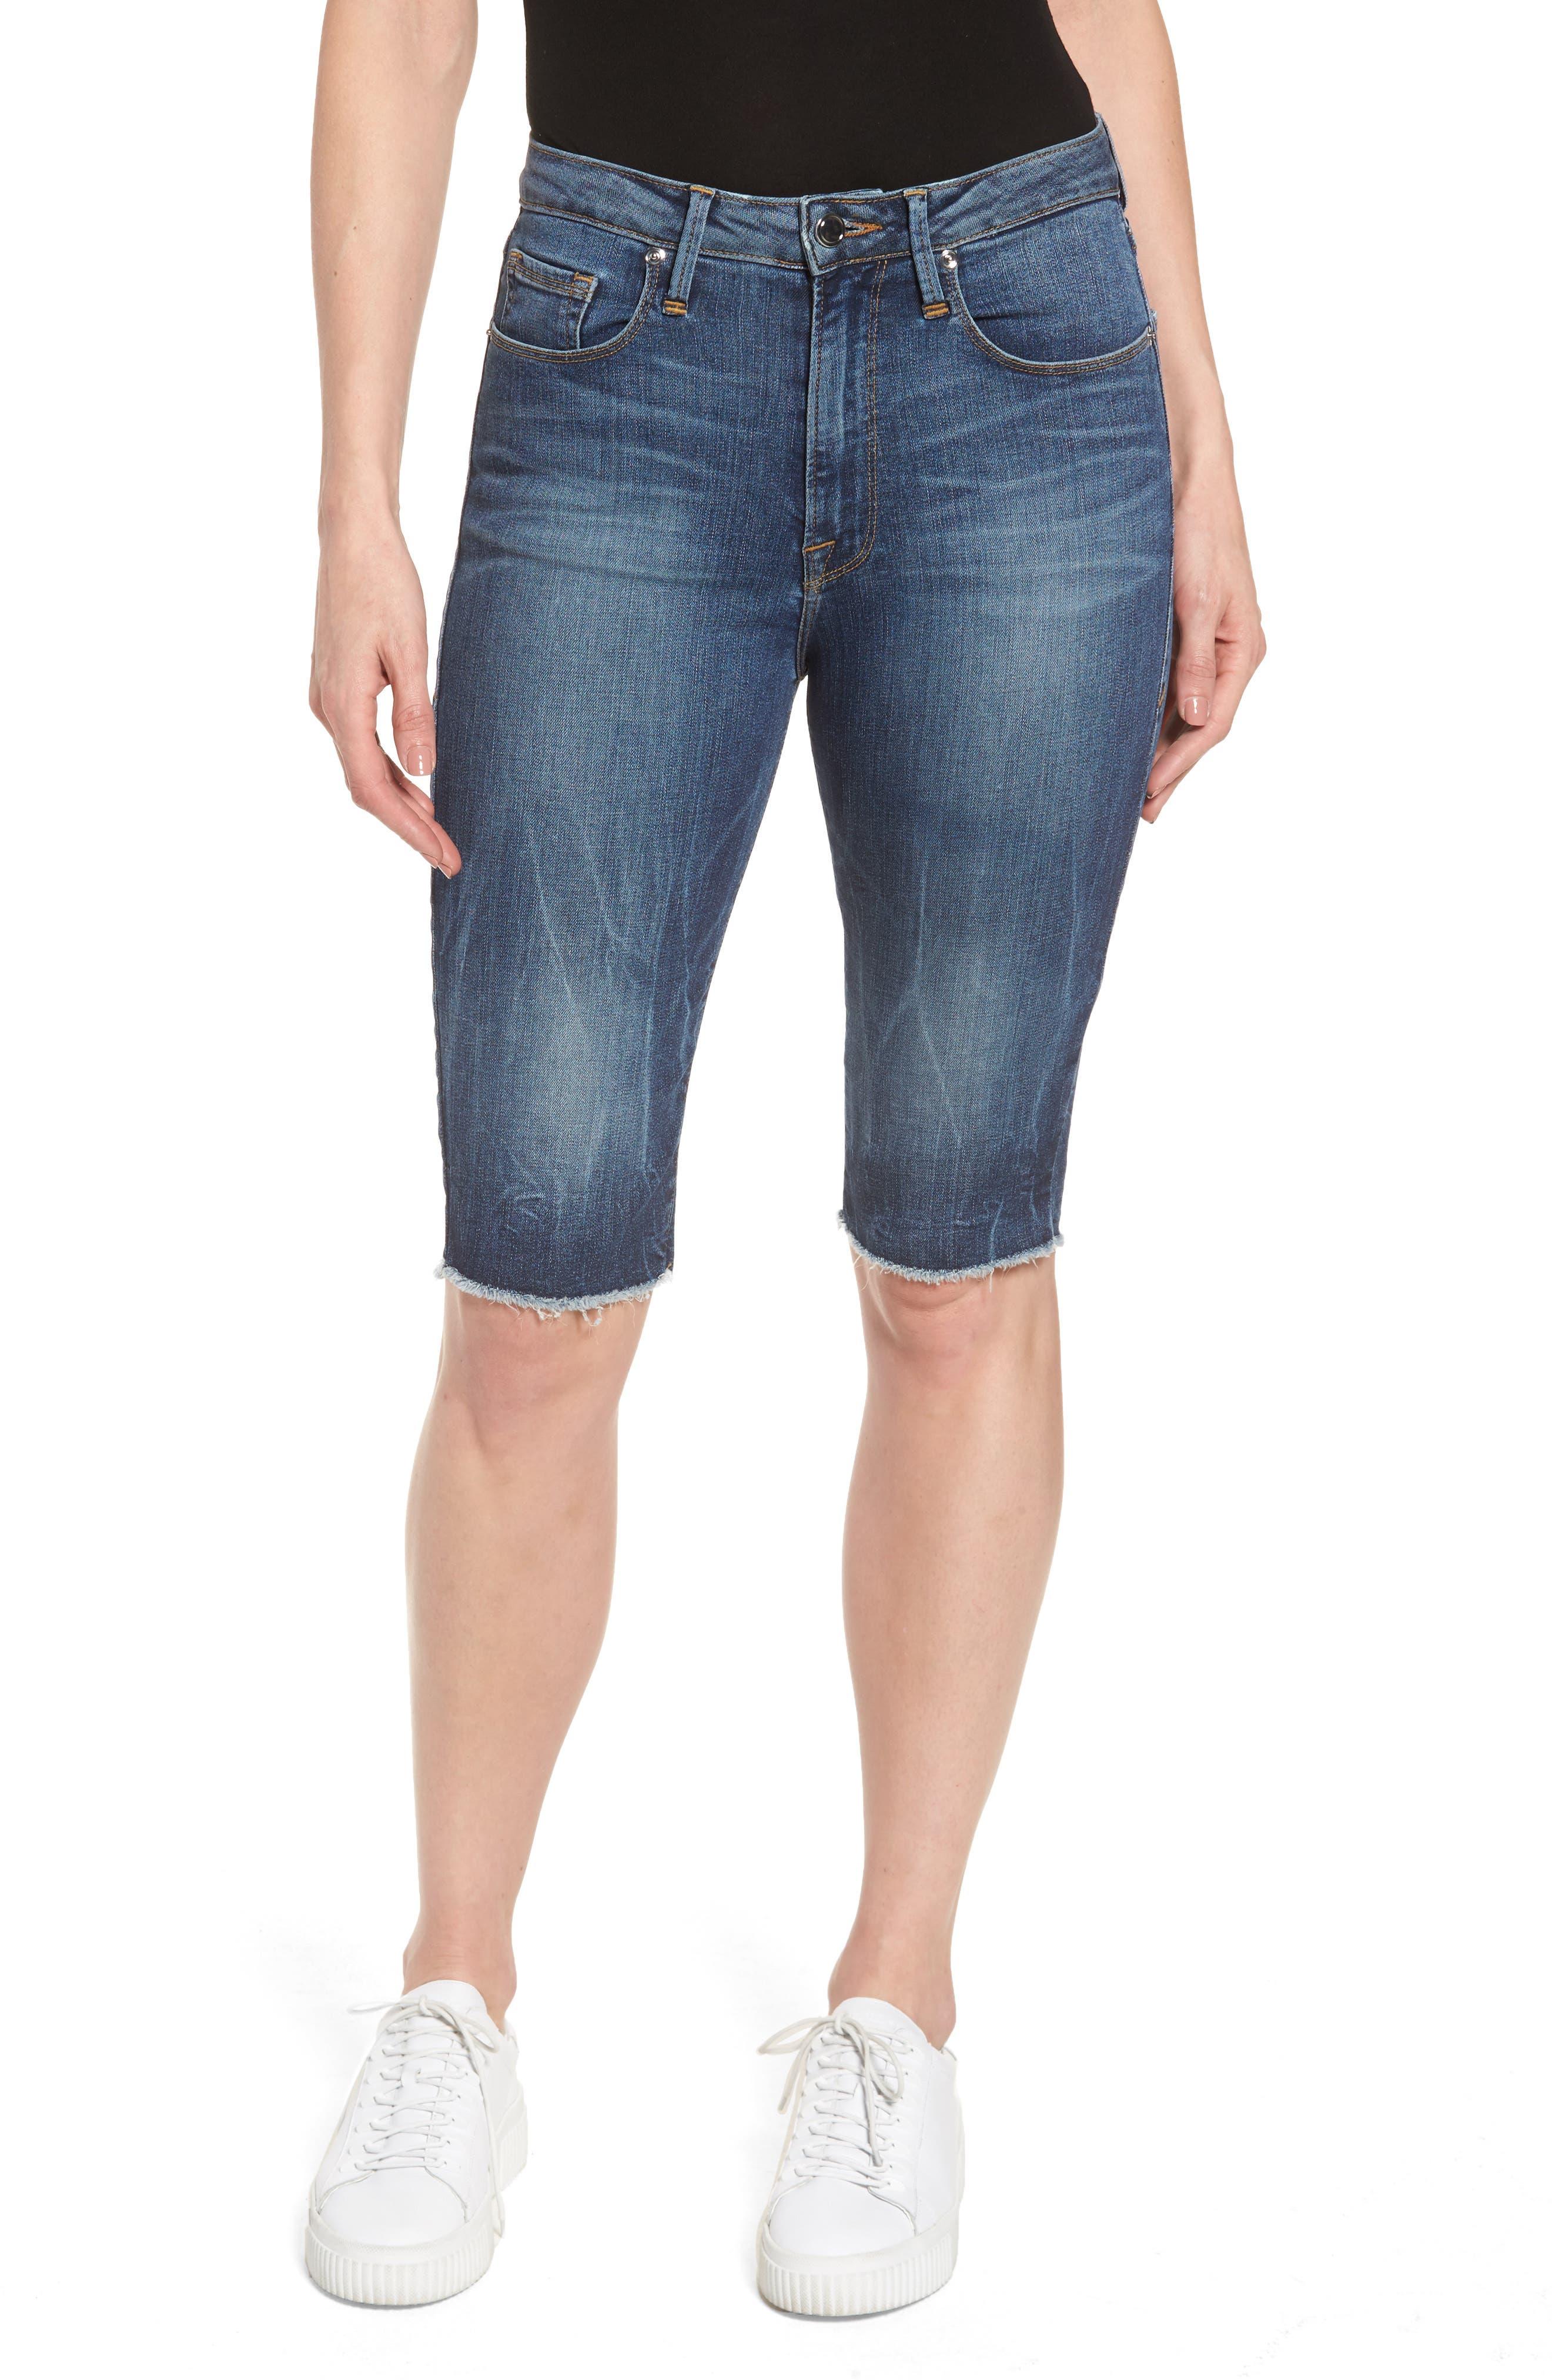 GOOD AMERICAN High Waist Denim Bermuda Shorts, Main, color, 402